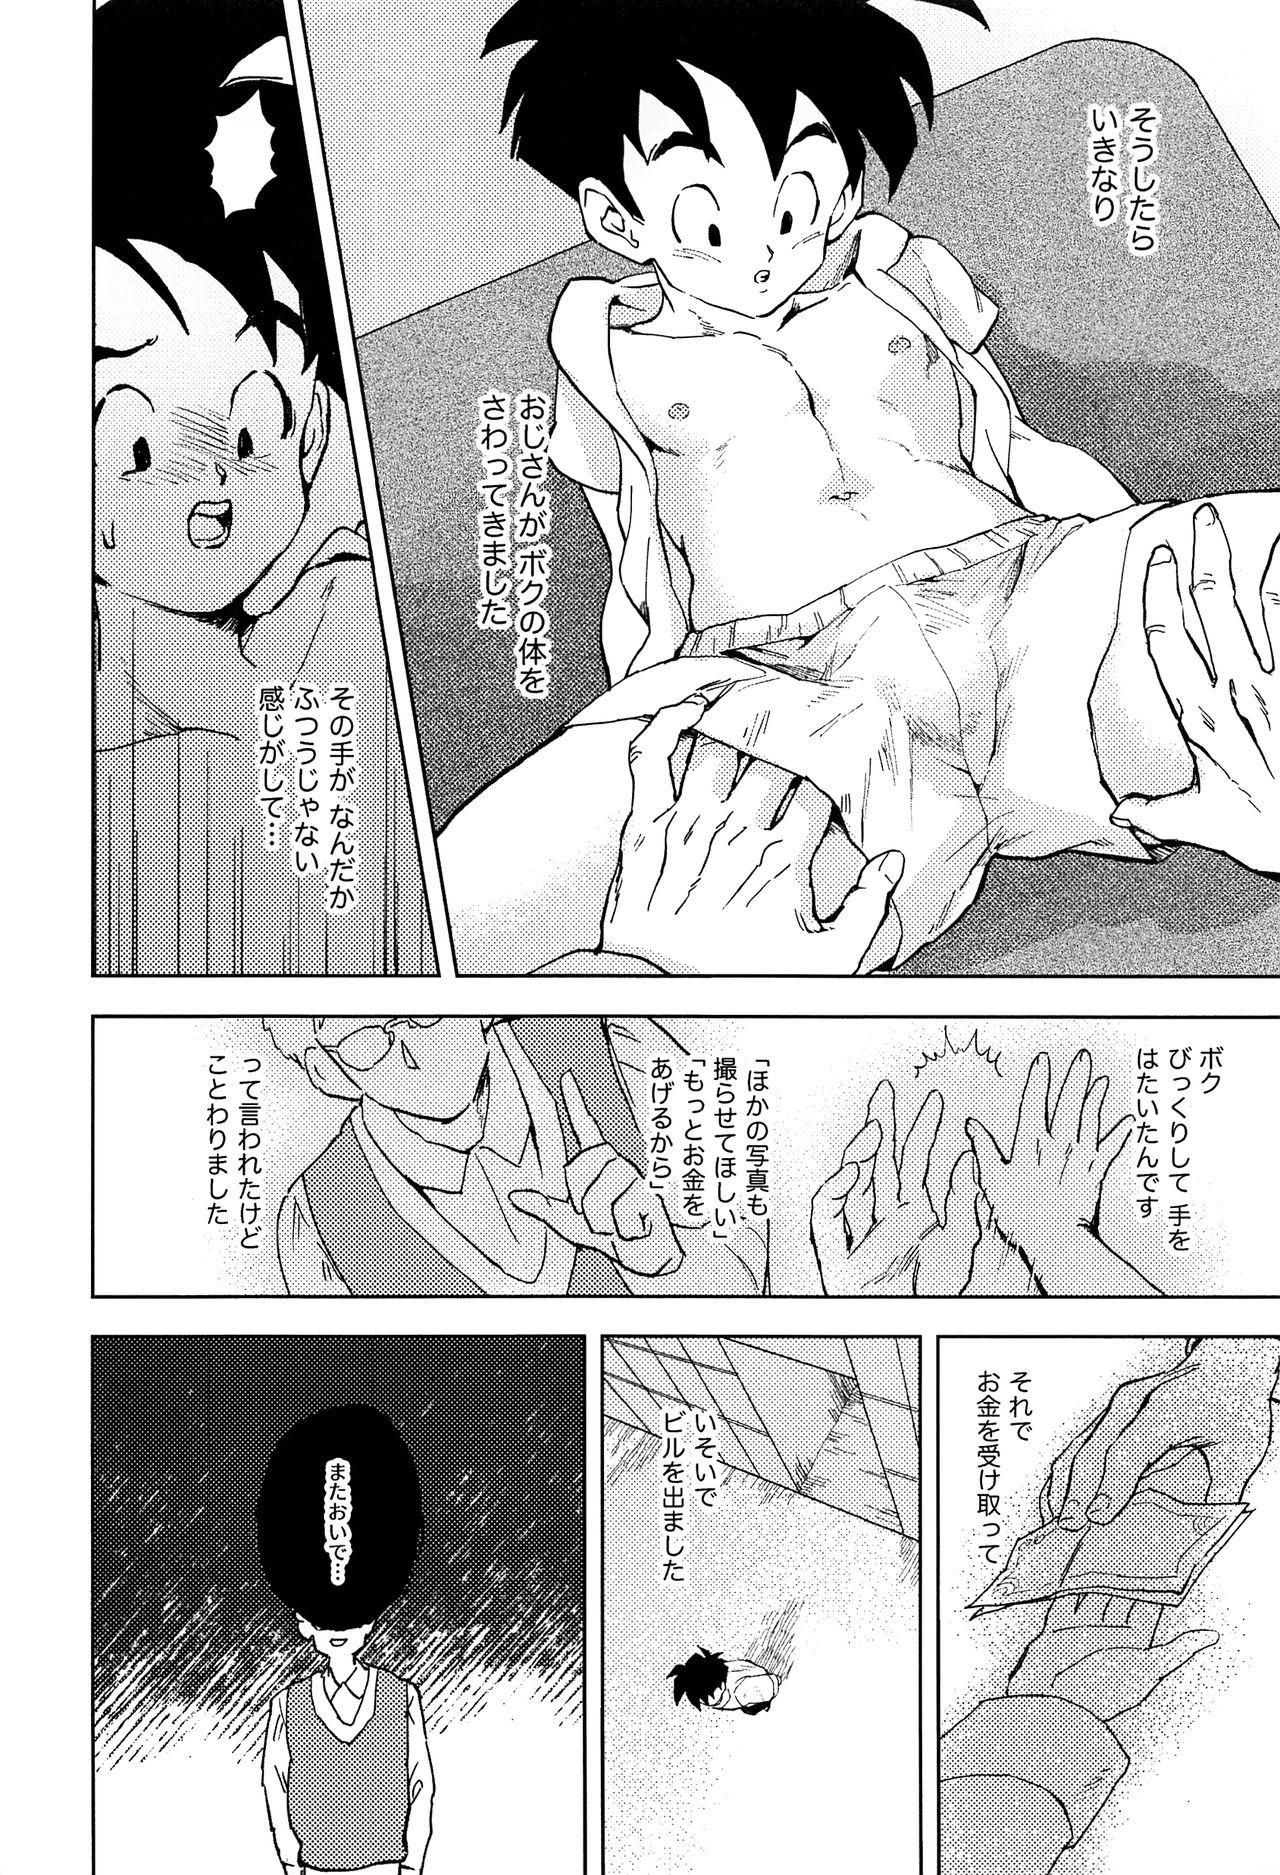 Odorokubeki Zanzou - WONDER BLUR 12